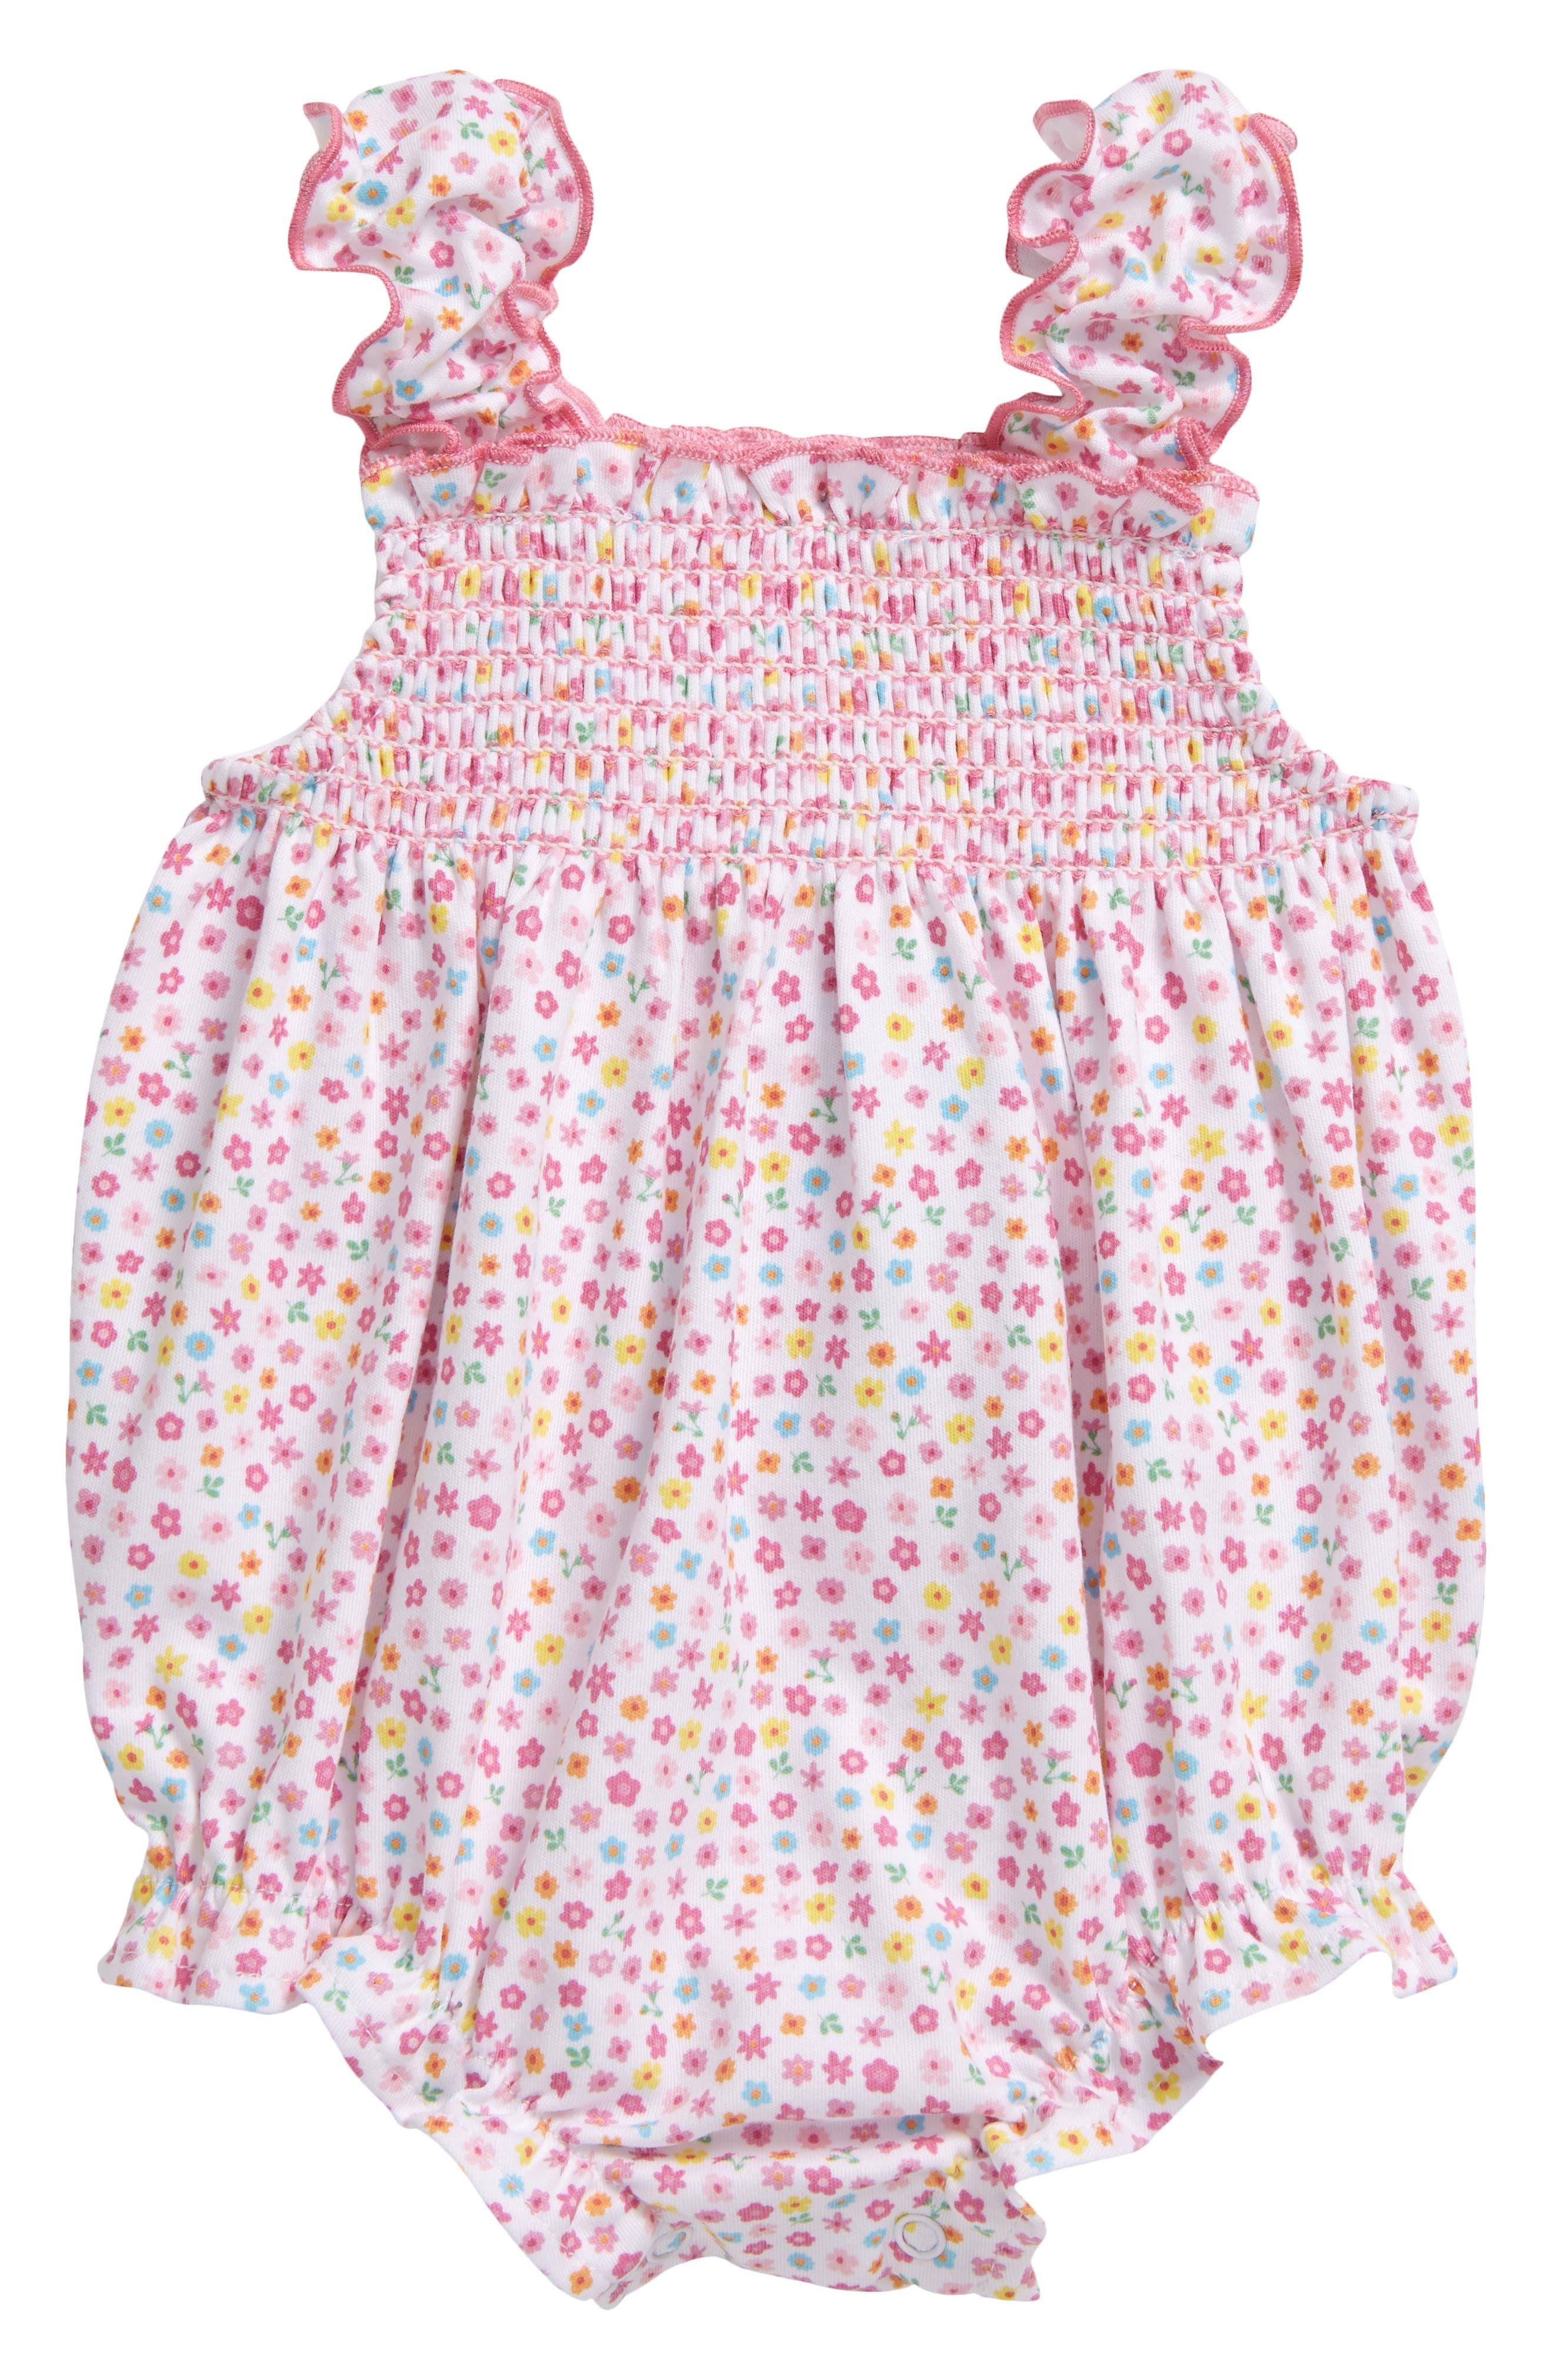 Kissy Kissy Infant Girl's Kissy Kissy Unicorn Gardens Floral Bubble Romper, Size 3-6M - Pink